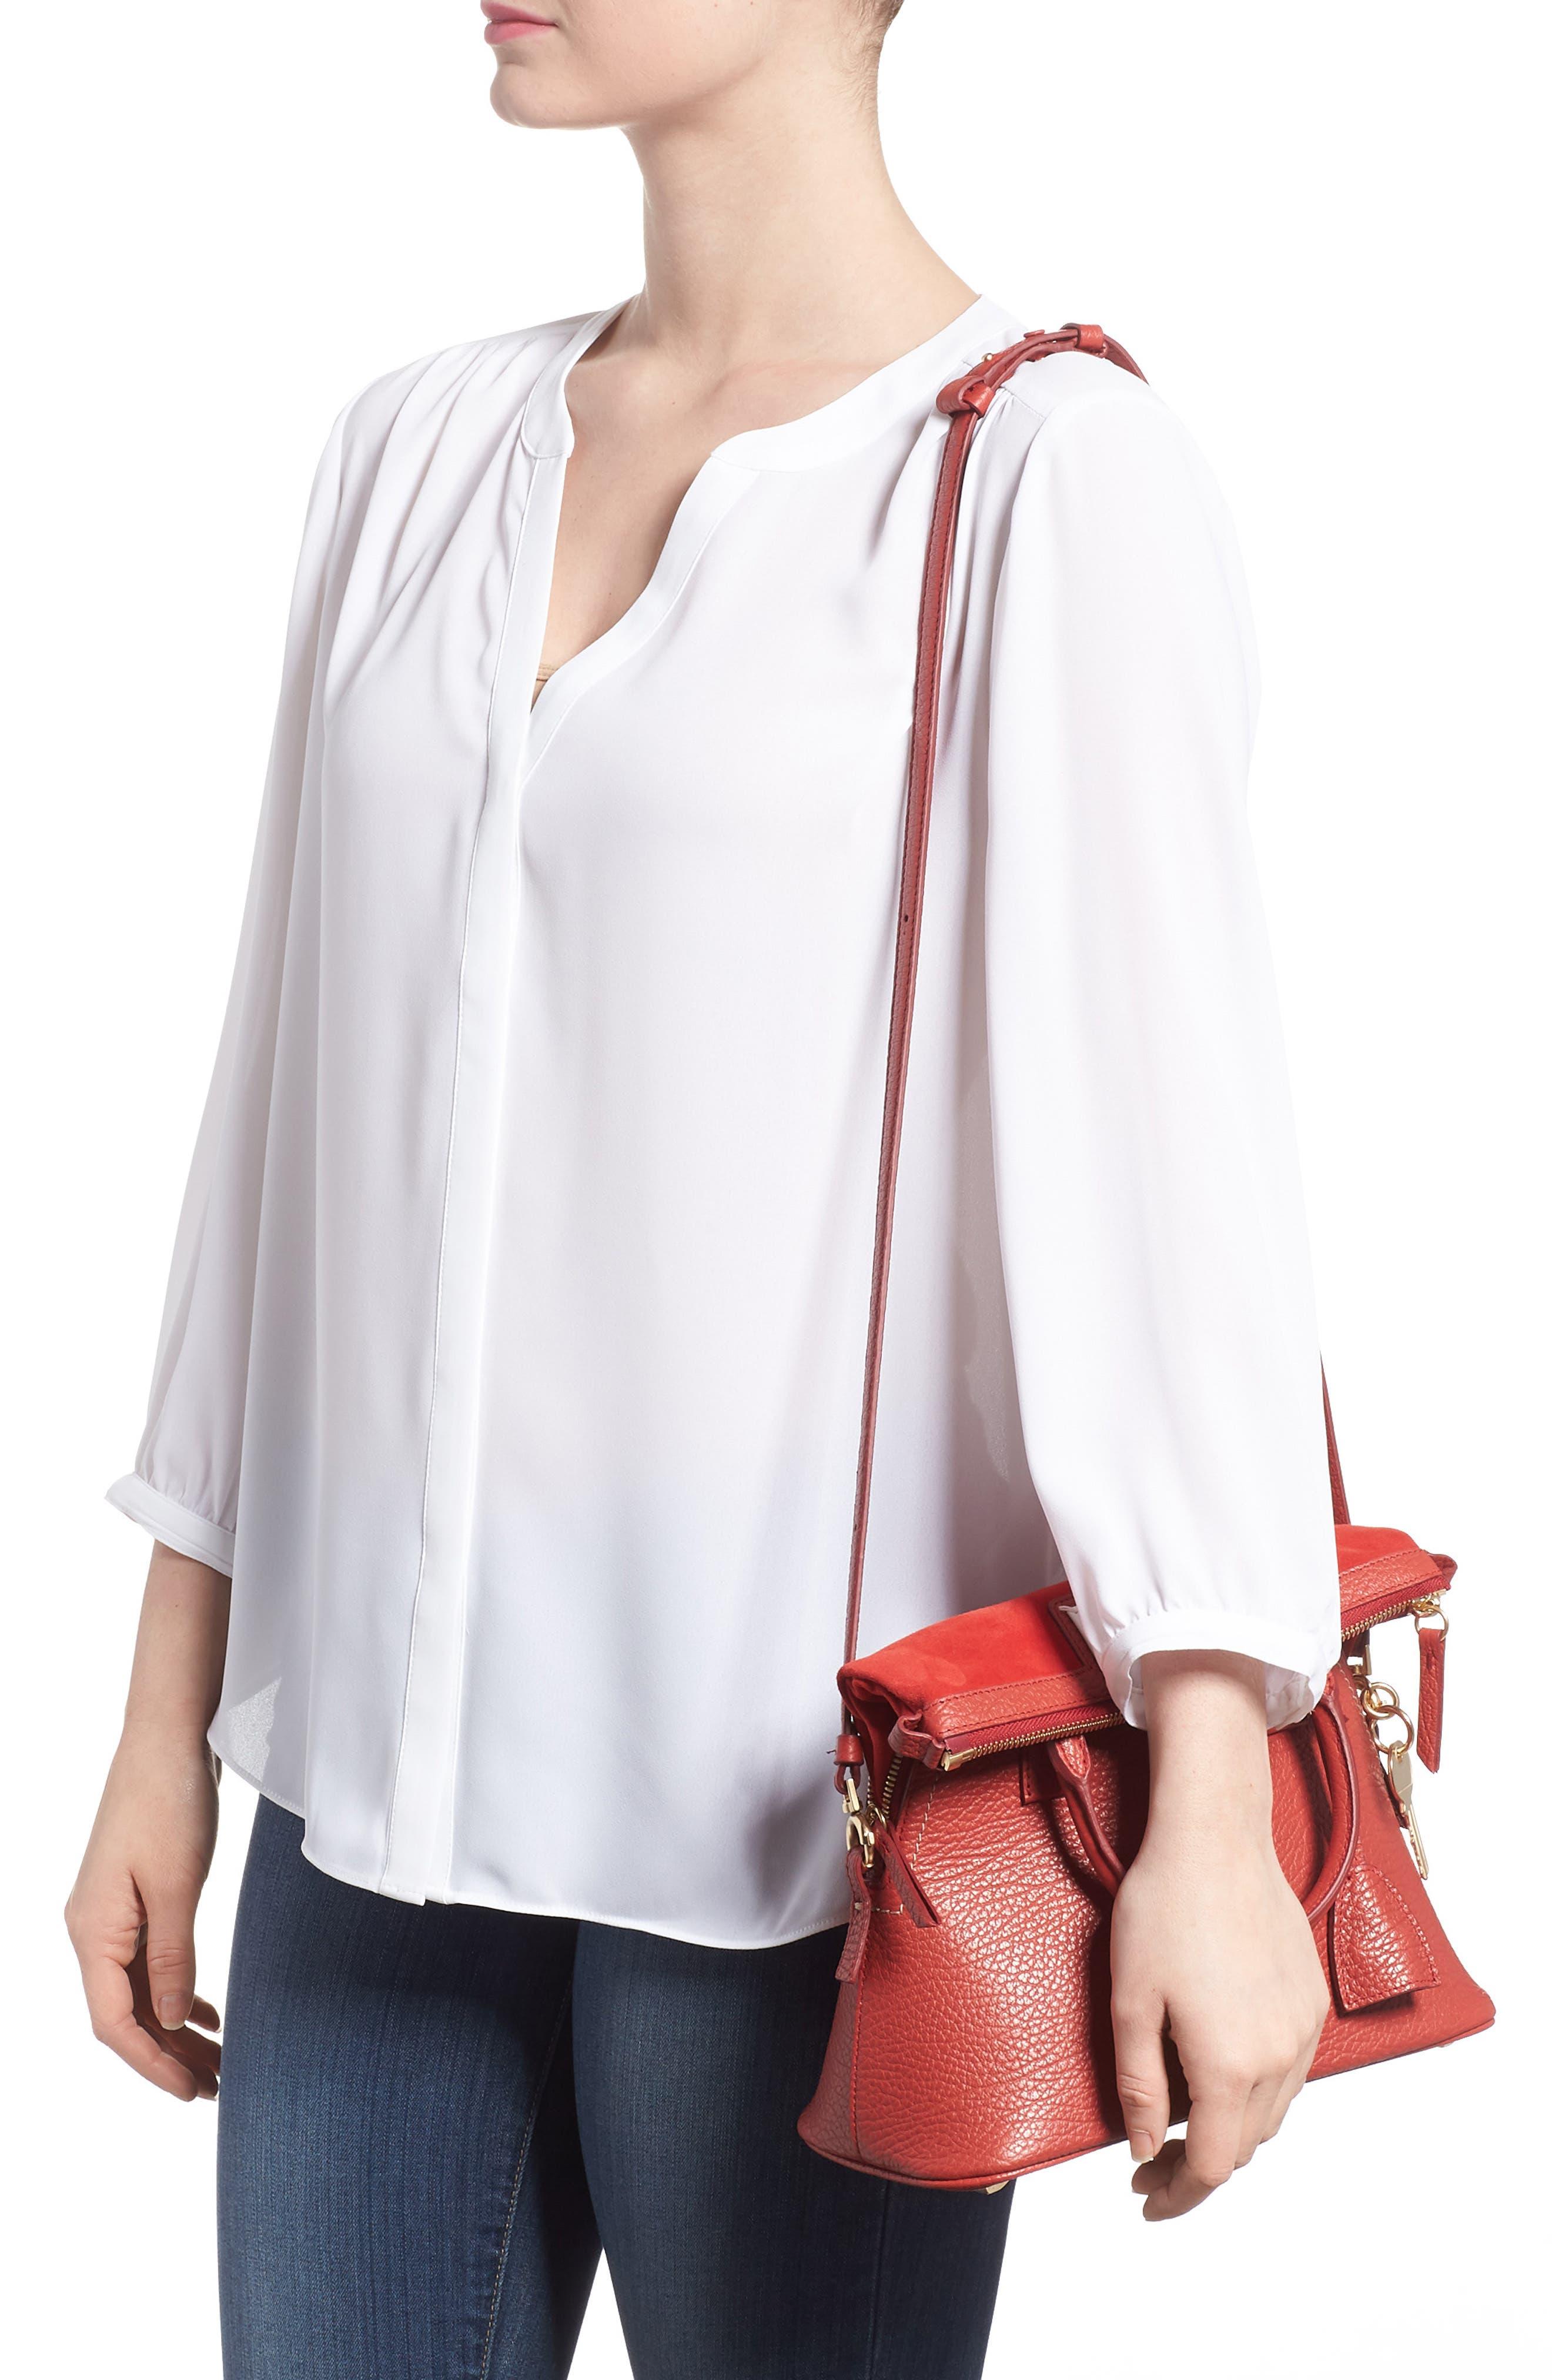 Small 5AC Calfskin Leather Handbag,                             Alternate thumbnail 2, color,                             600